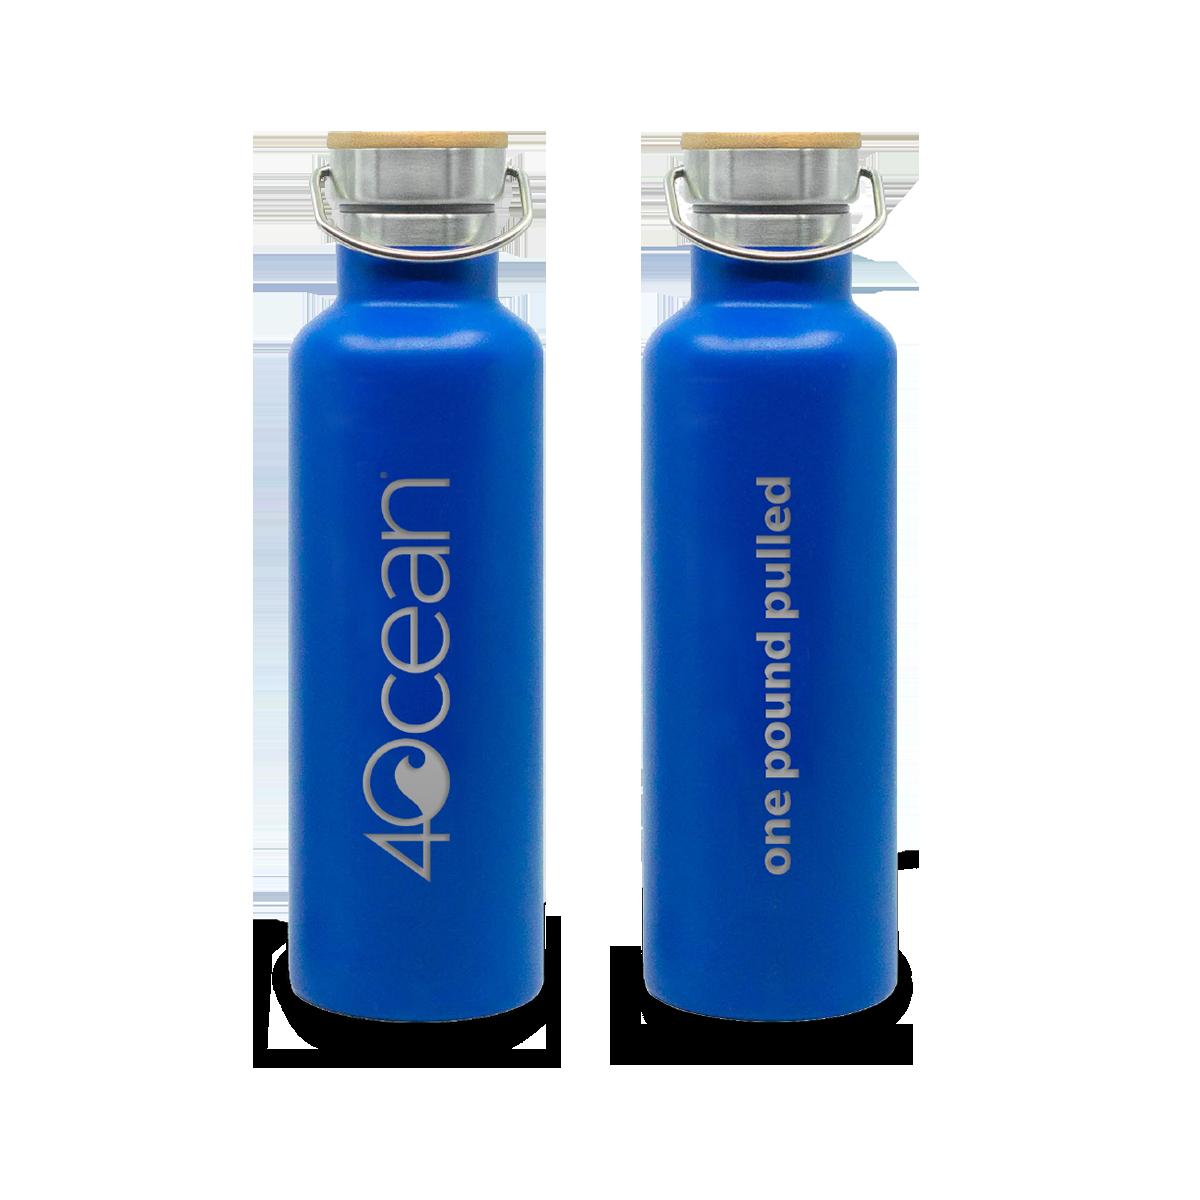 4ocean Reusable Bottle - Blue